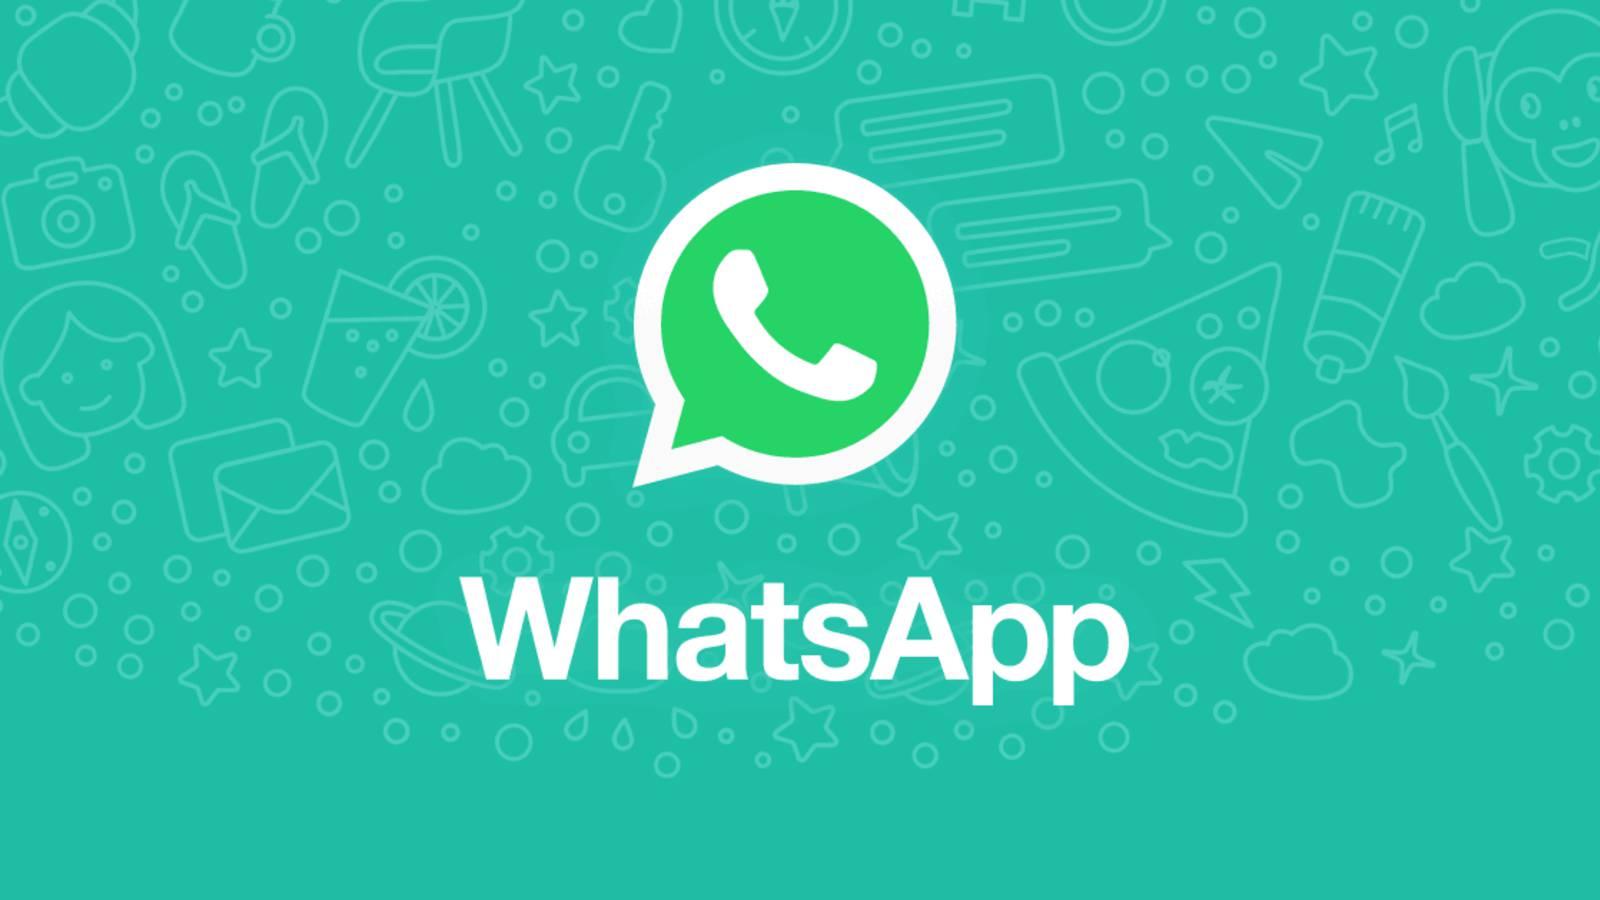 whatsapp website